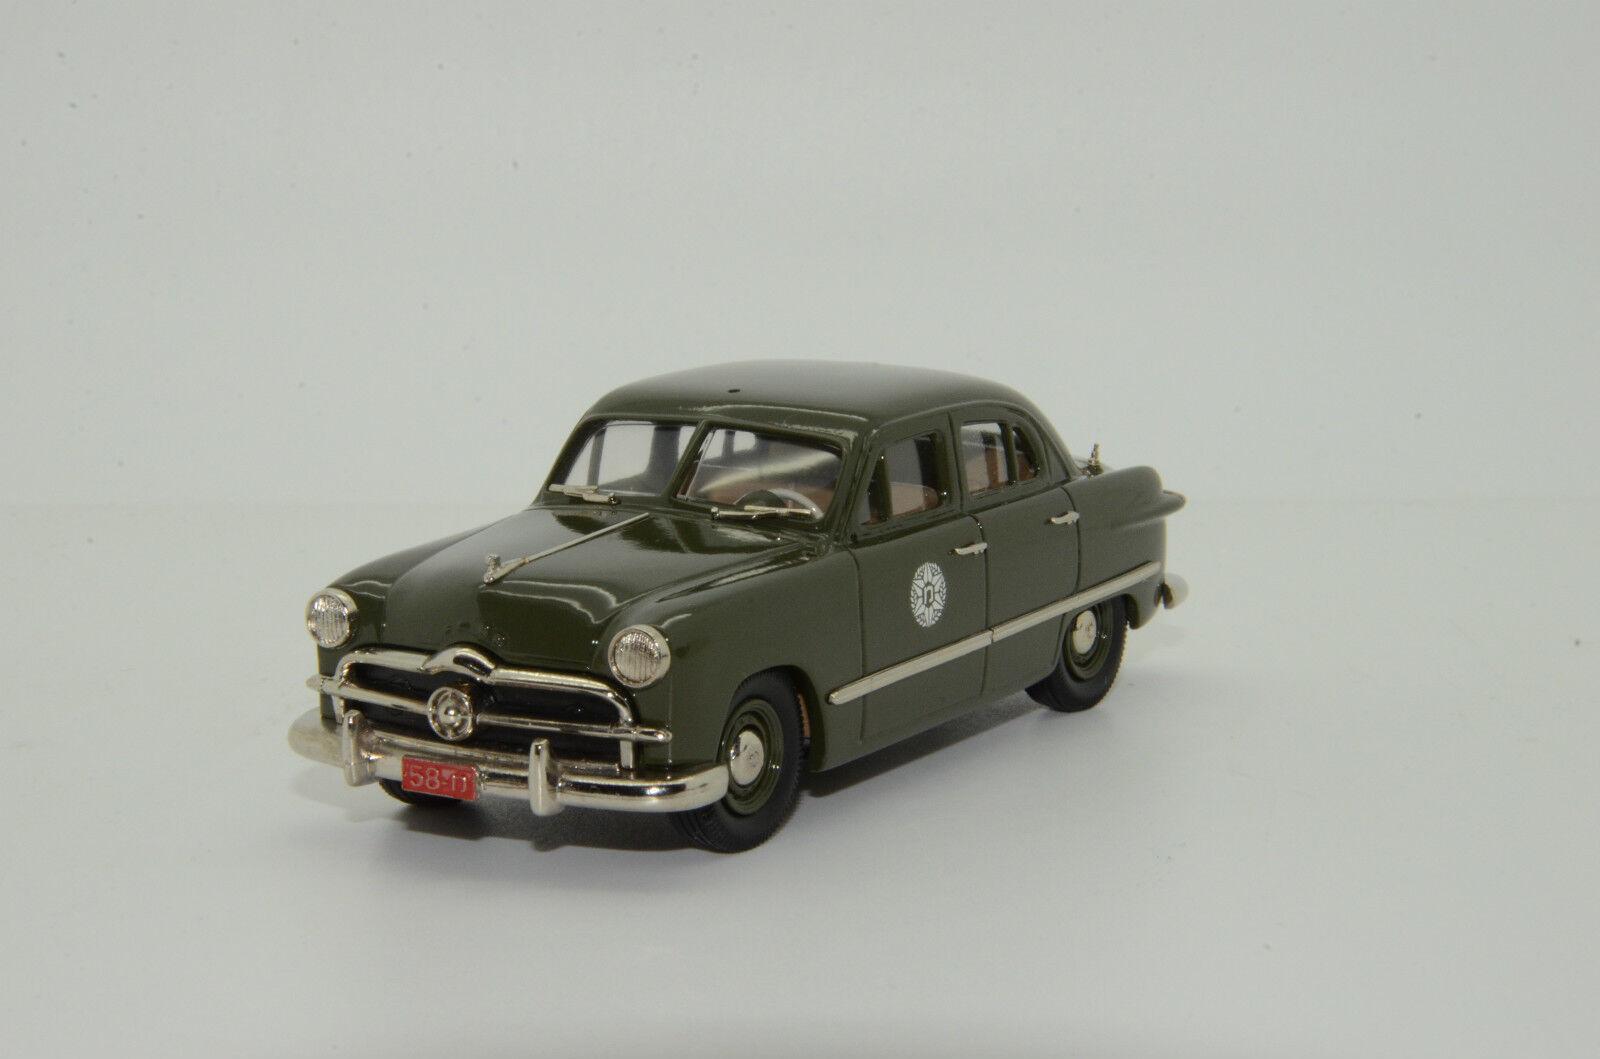 Rare     Ford Fordor 1949 Sedan Israel Police BRK. ISR 05 Brooklin  1 43